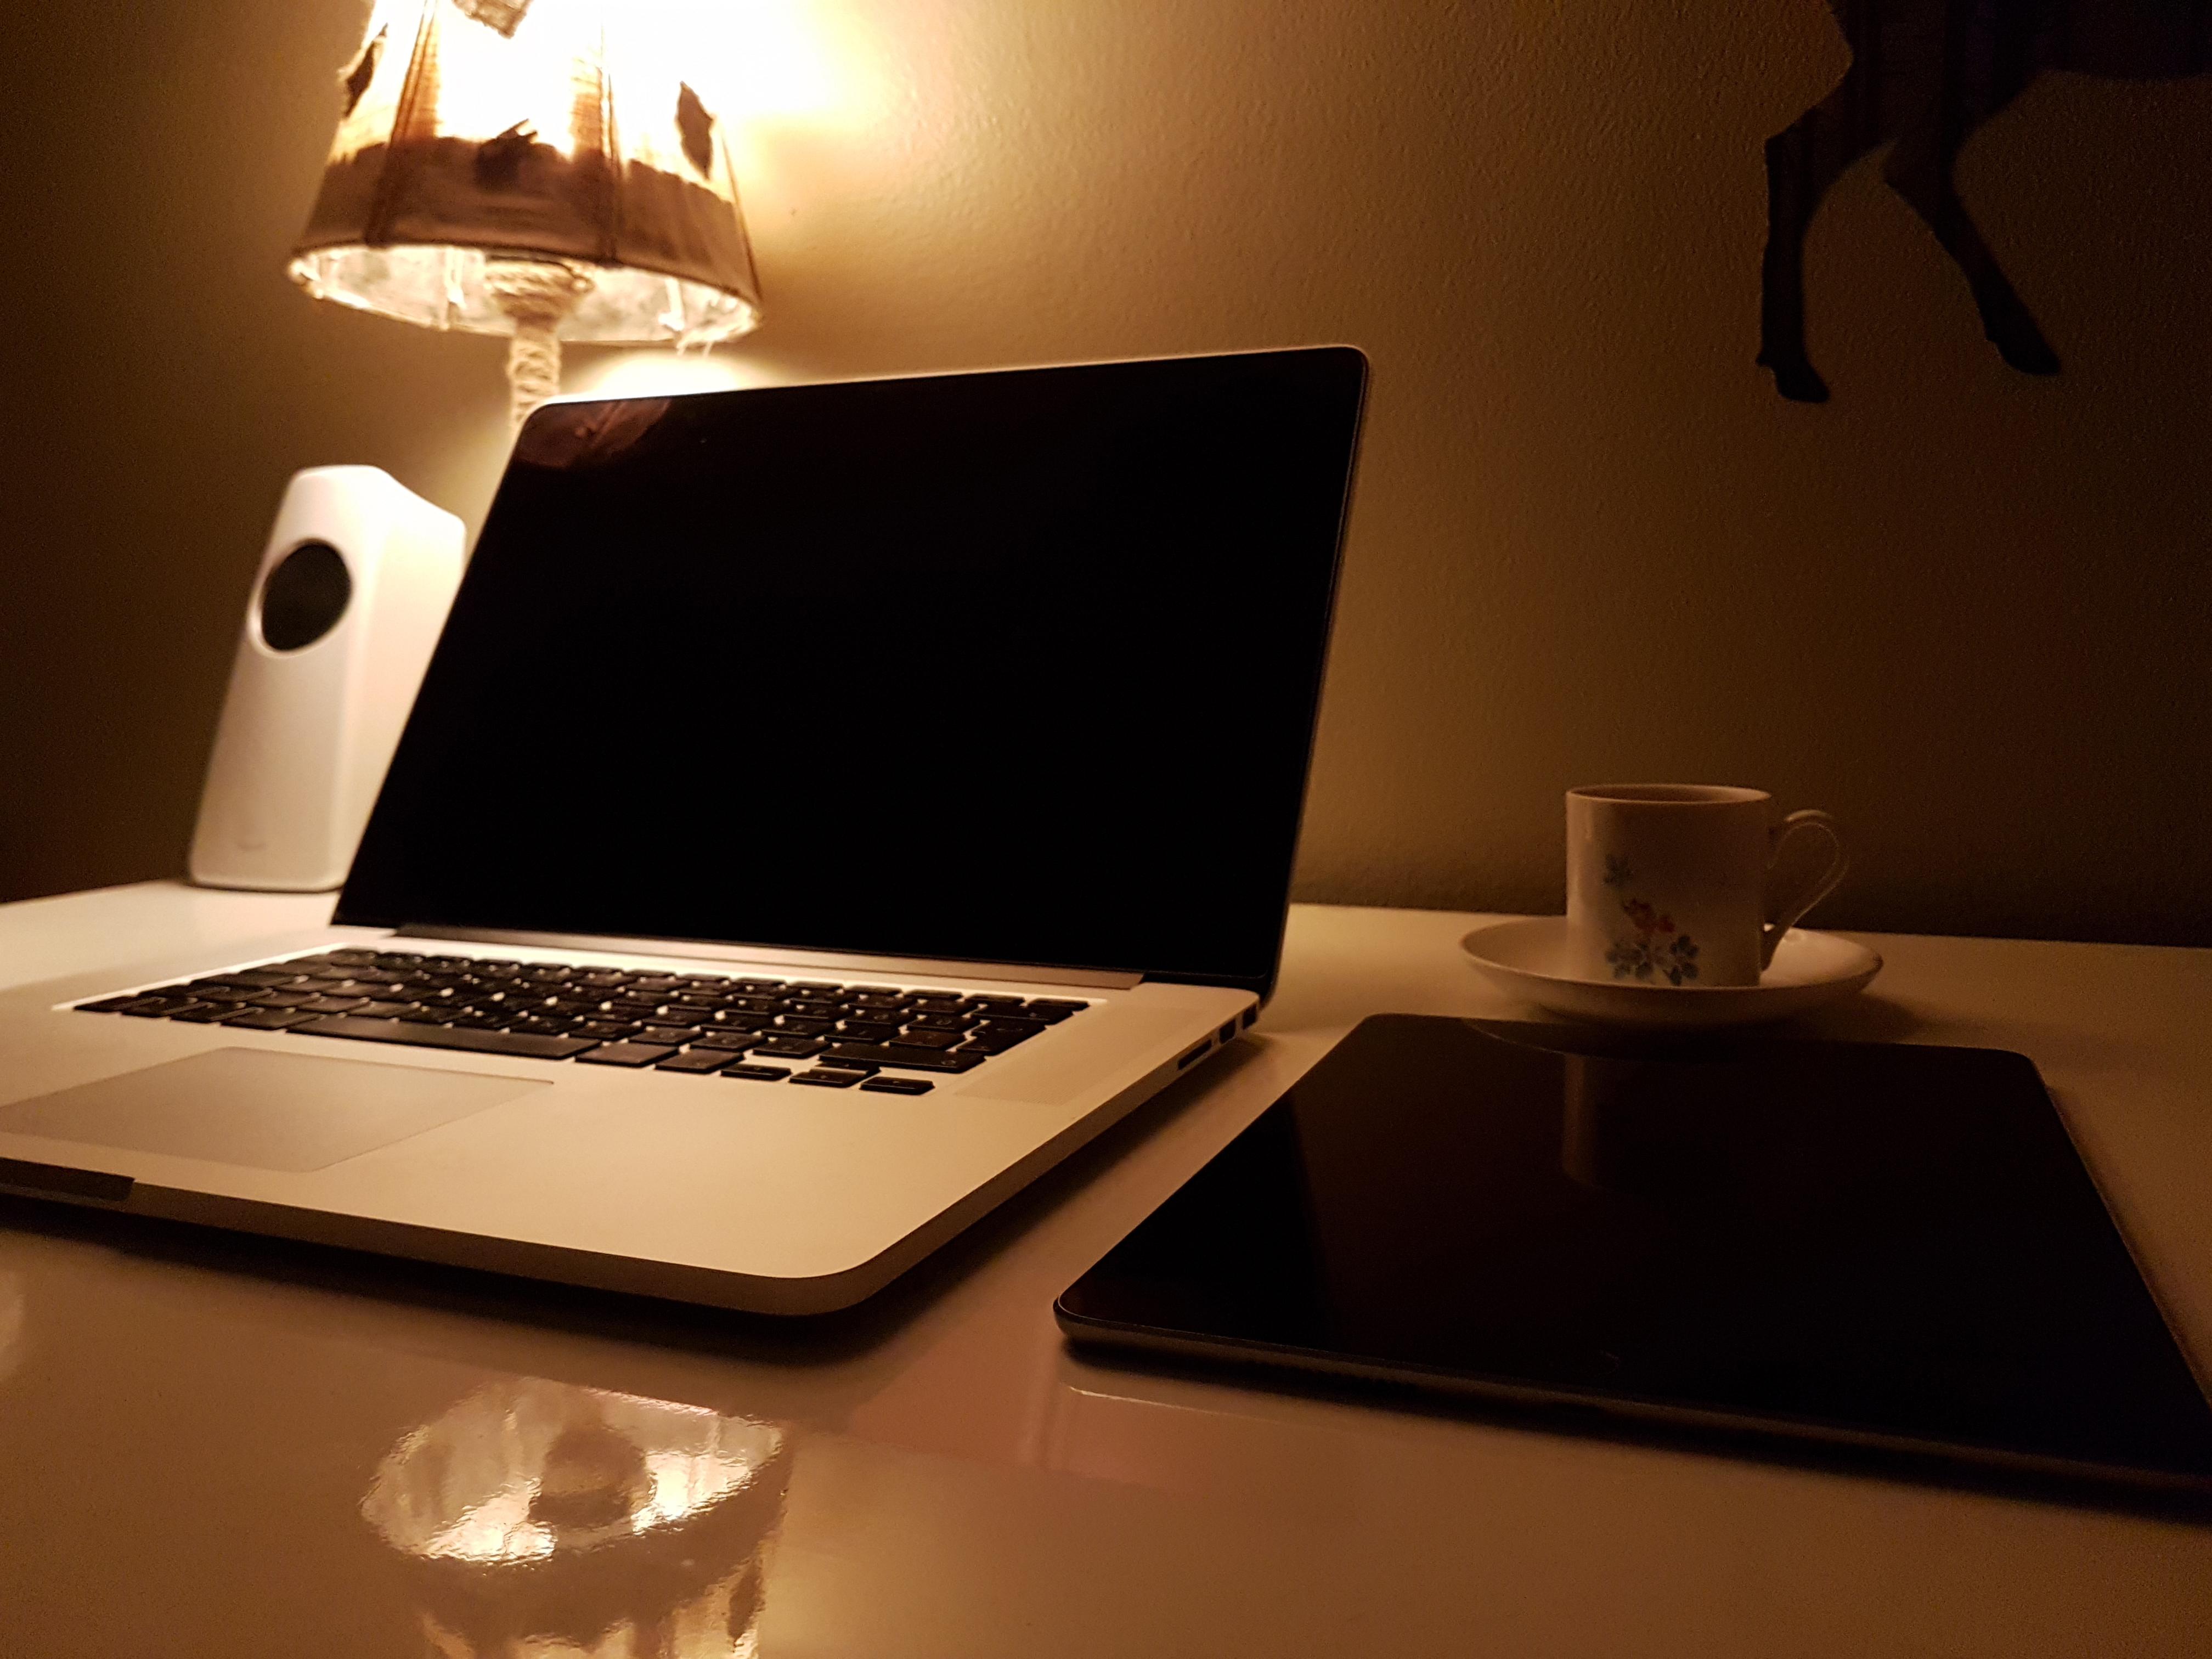 Fotos gratis : ordenador portátil, escritorio, computadora, Macbook ...